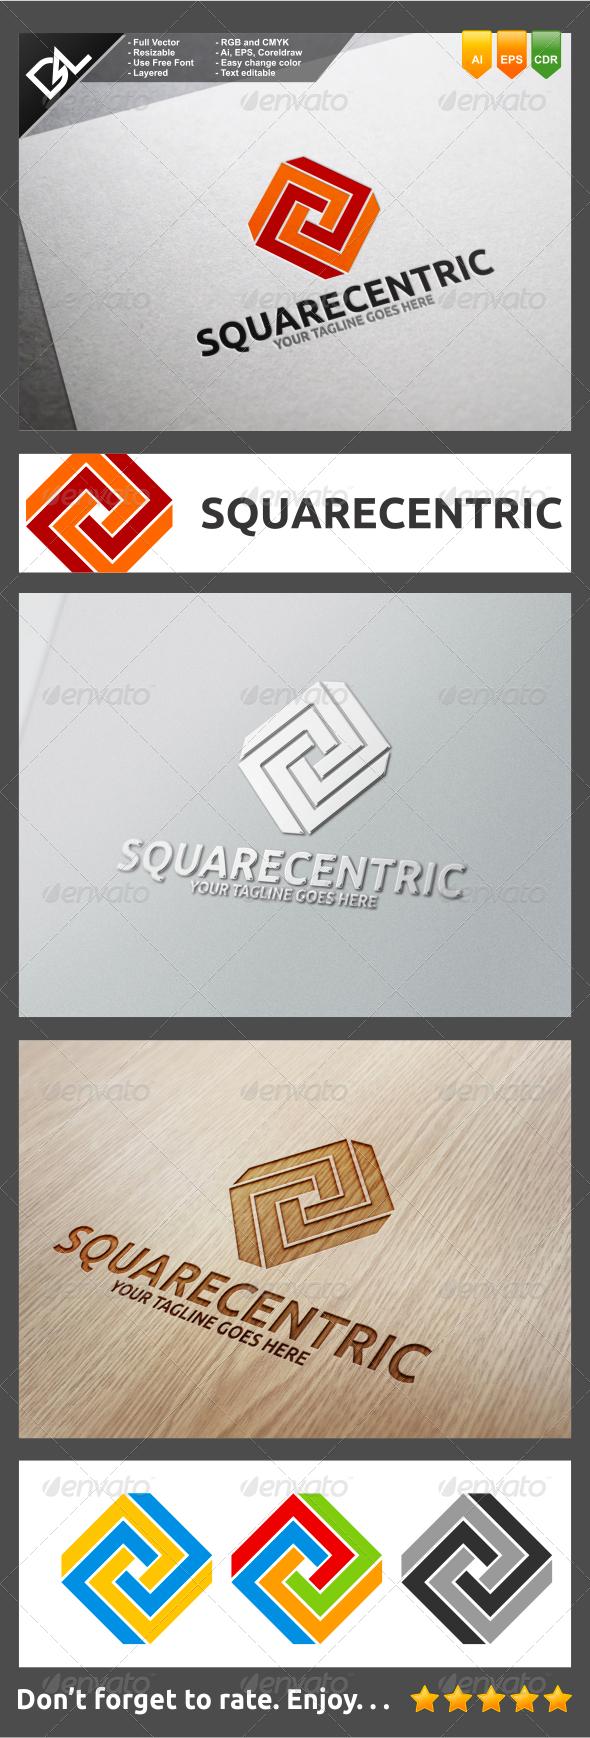 GraphicRiver Squarecentric 8232187